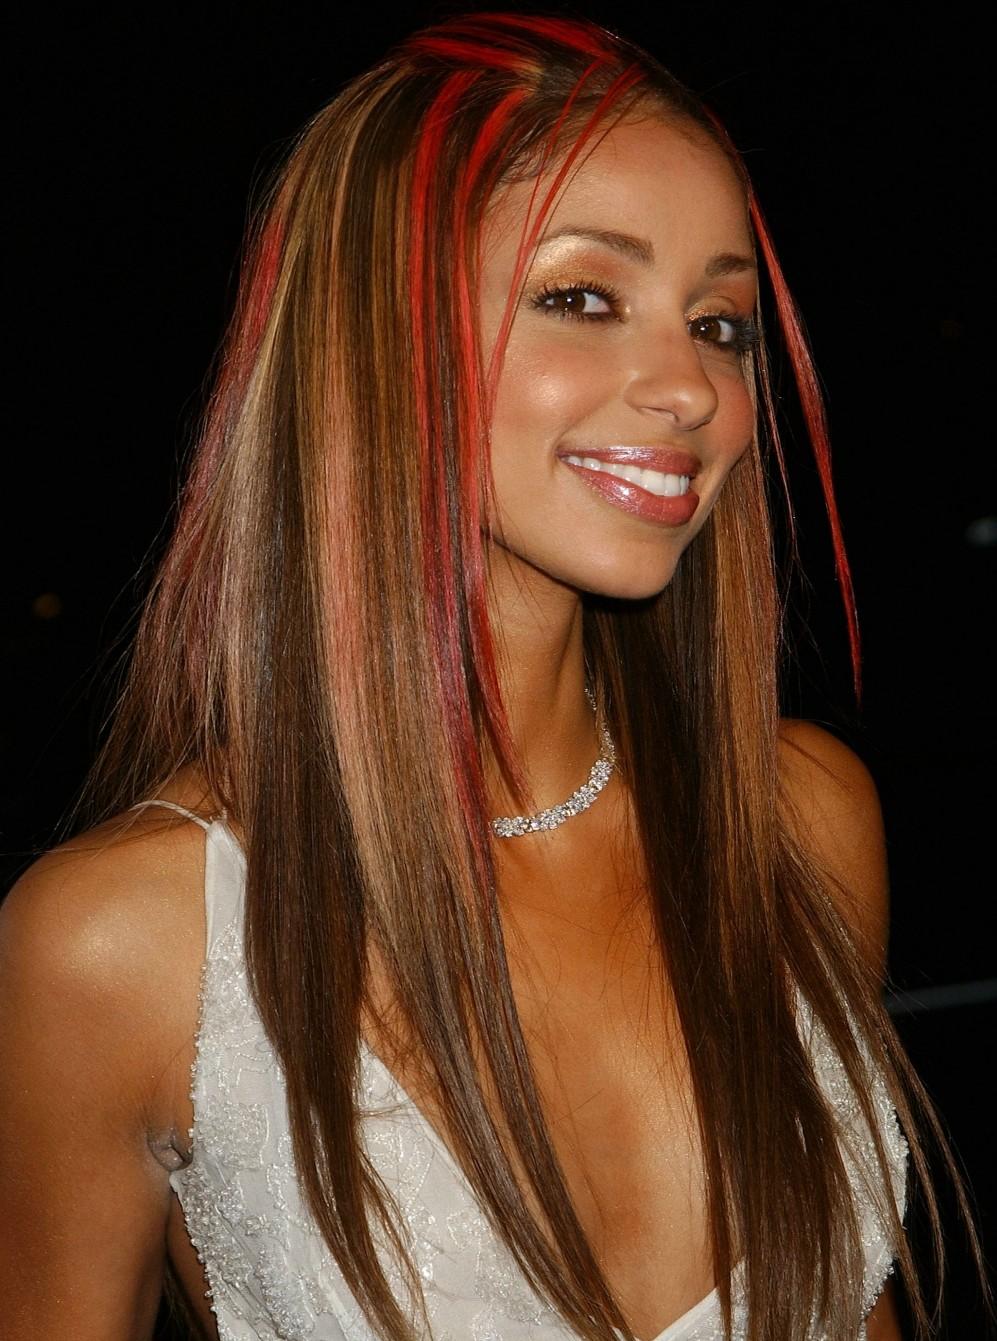 1990s rampb singer mya is now 039dancing039 at strip clubs 6